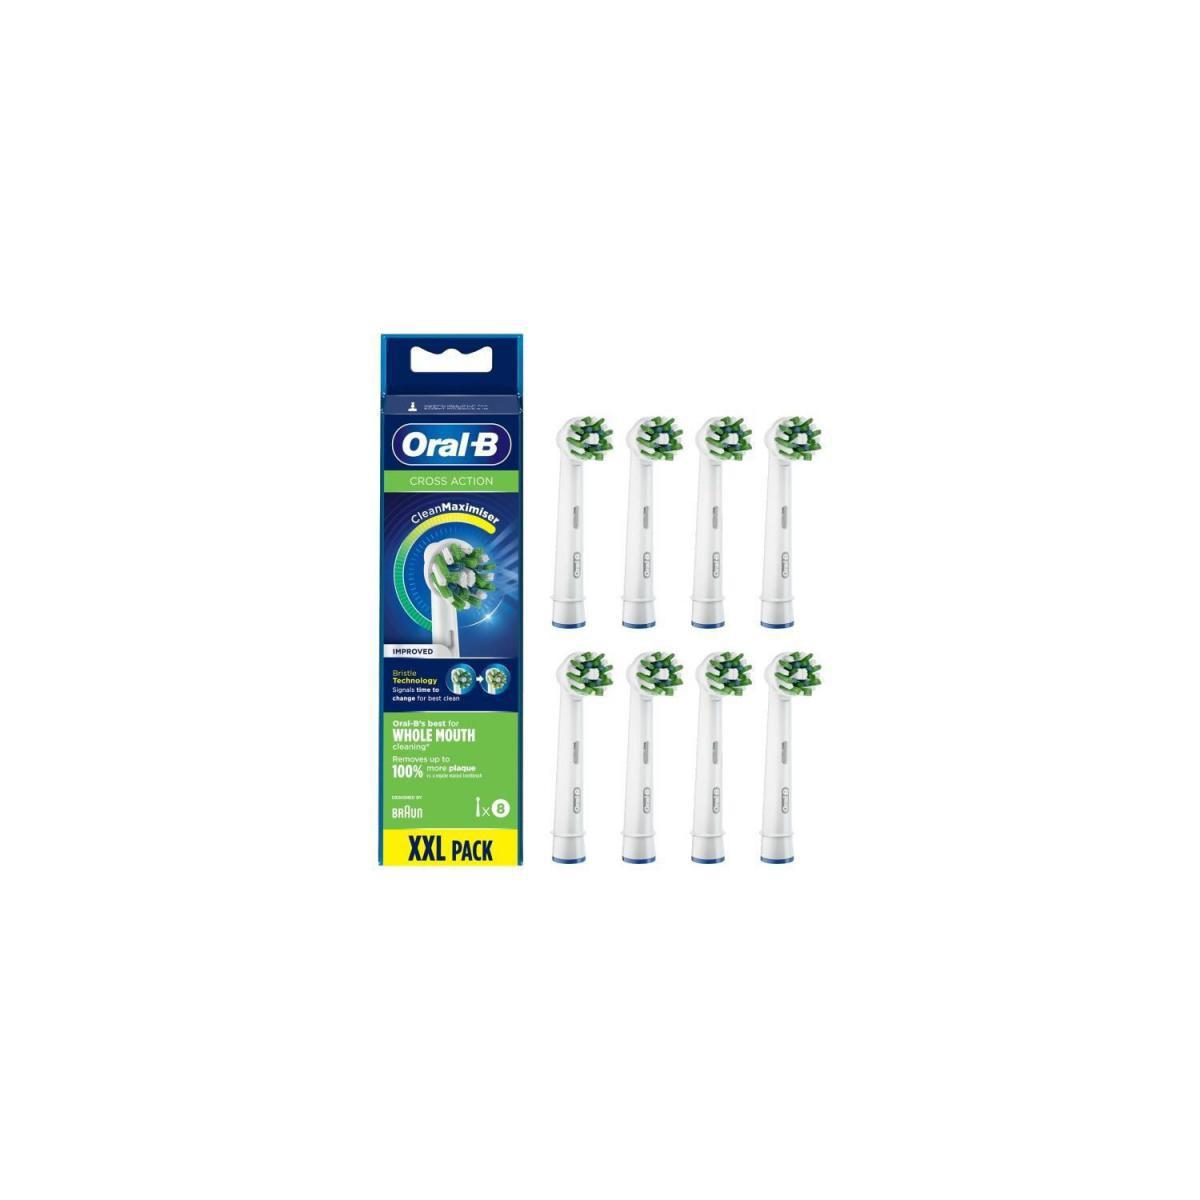 Oral-B Oral-B CrossAction Brossette Avec CleanMaximiser, 8